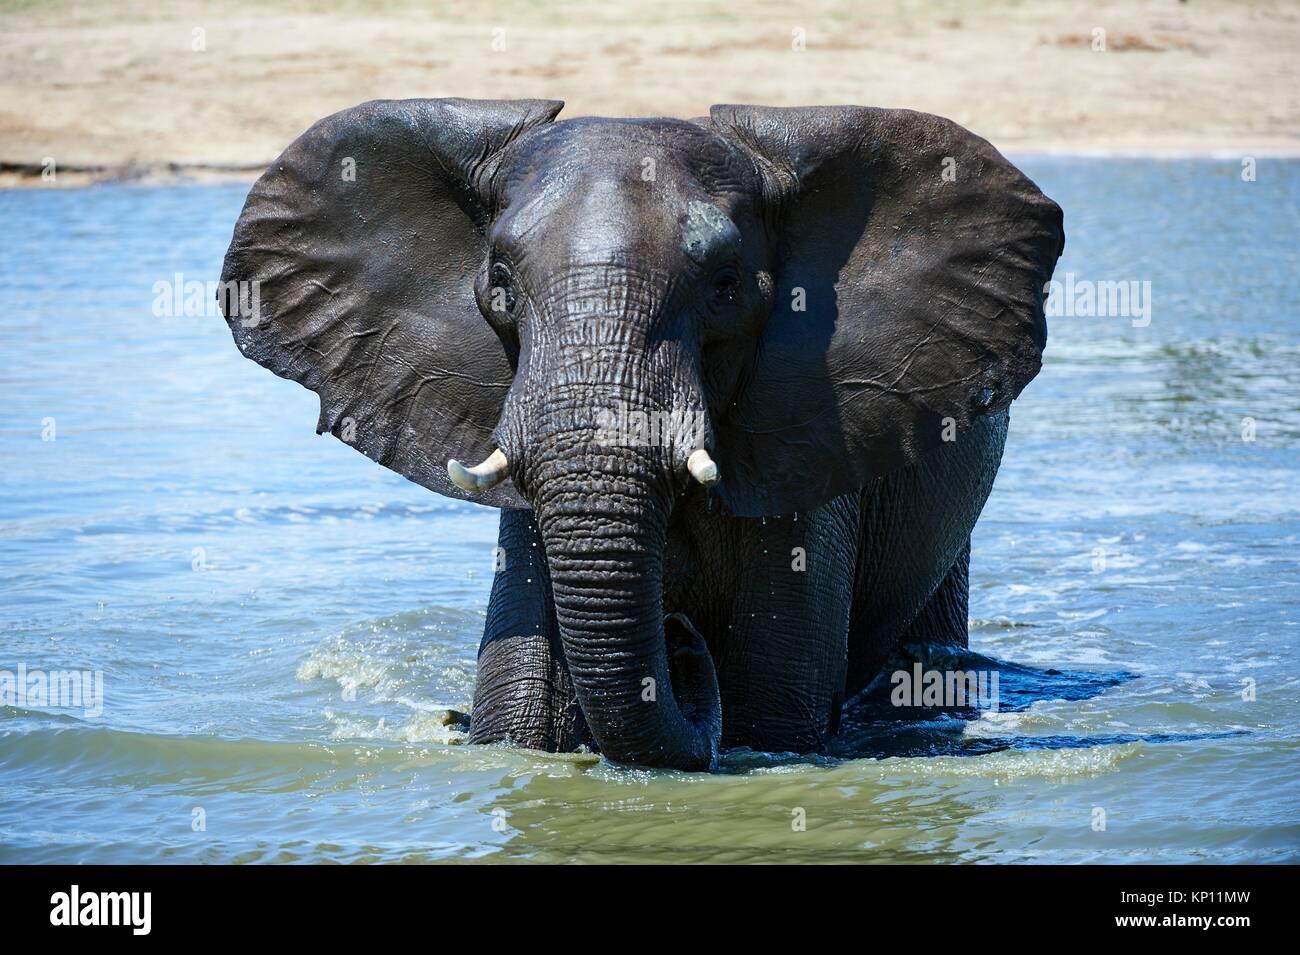 Afrikanischer Elefant (Loxodonta africana) trinken und baden an einem watehole. Hwange National Park, Zimbabwe. Stockbild